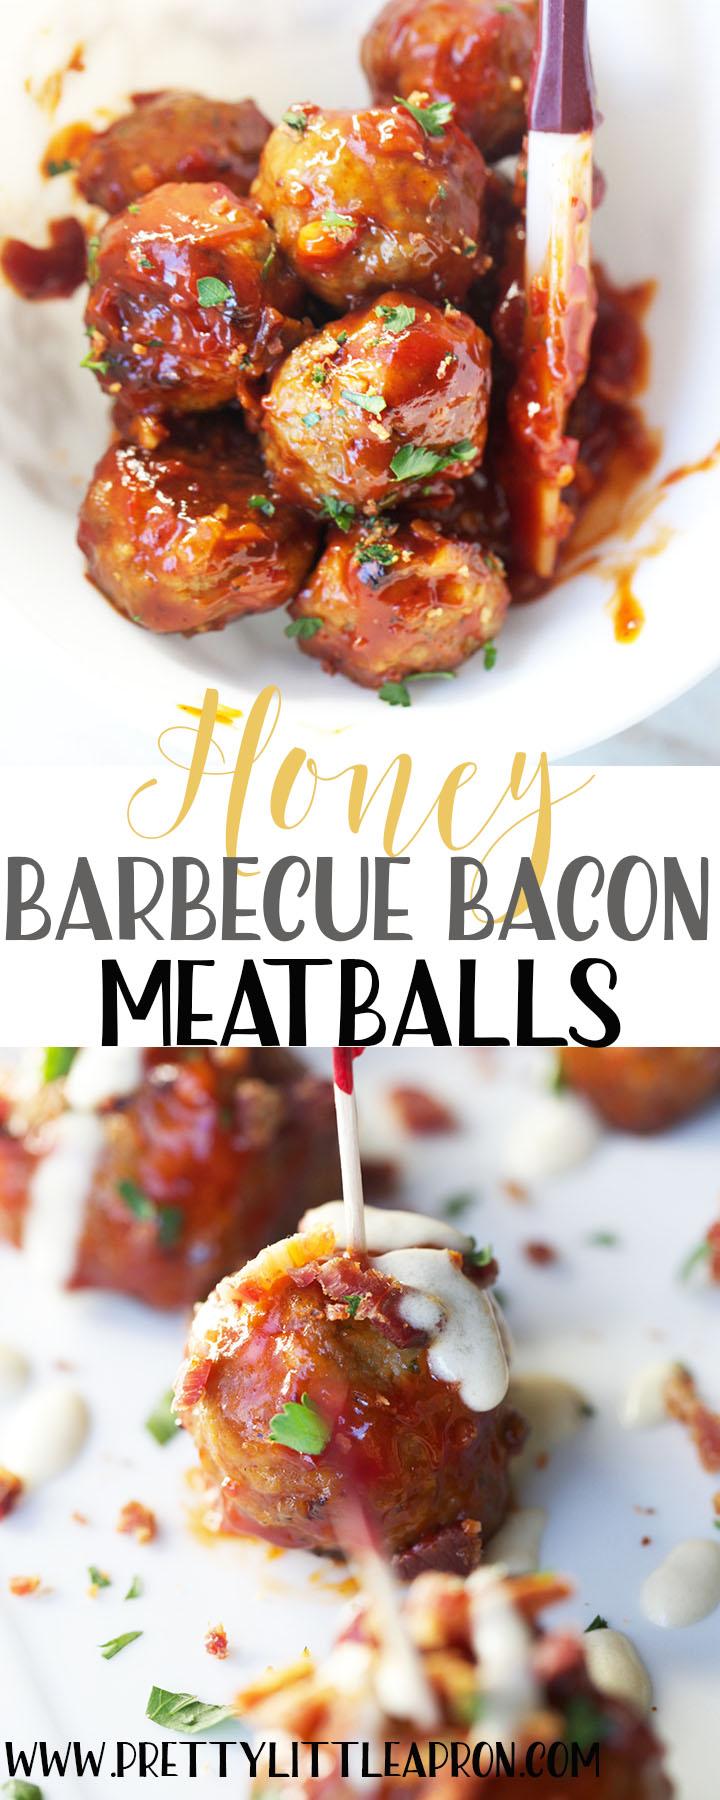 Honey Barbecue Bacon Meatballs #meatballs, #meatballsrecipes, #barbecue, #honeybarbecue, #gamedayrecipes, #superbowlrecipes